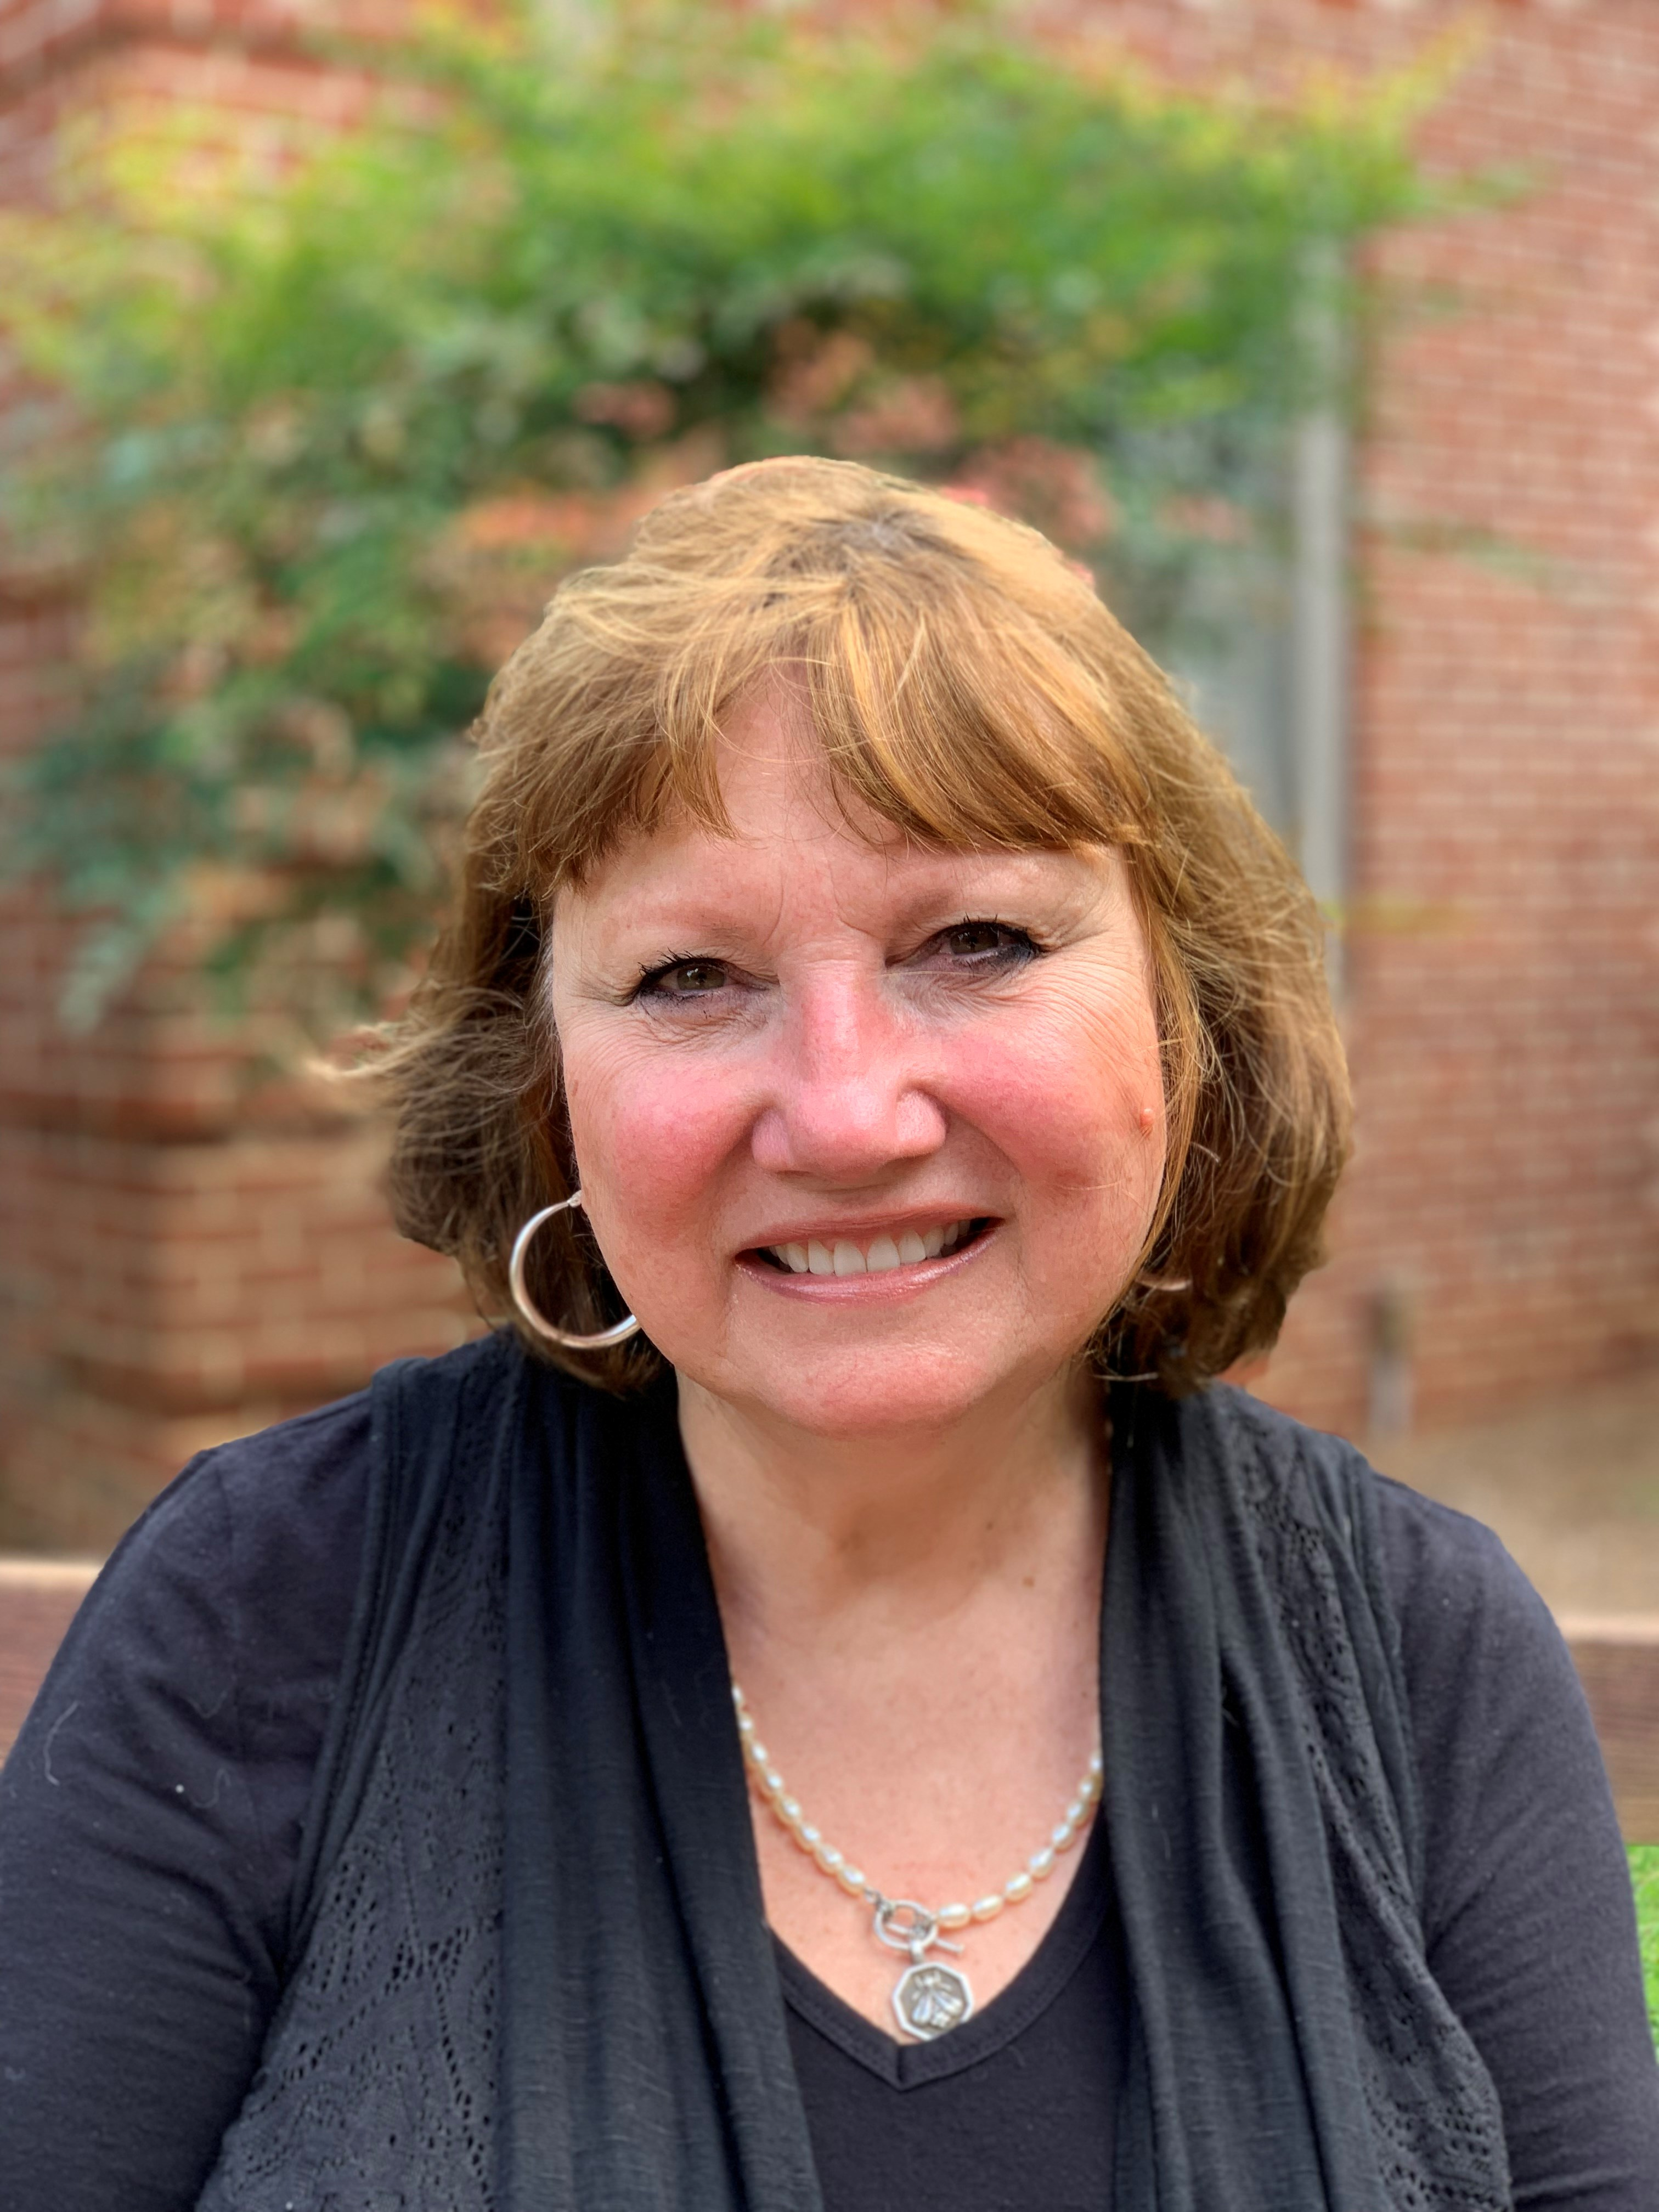 Cindy Darden